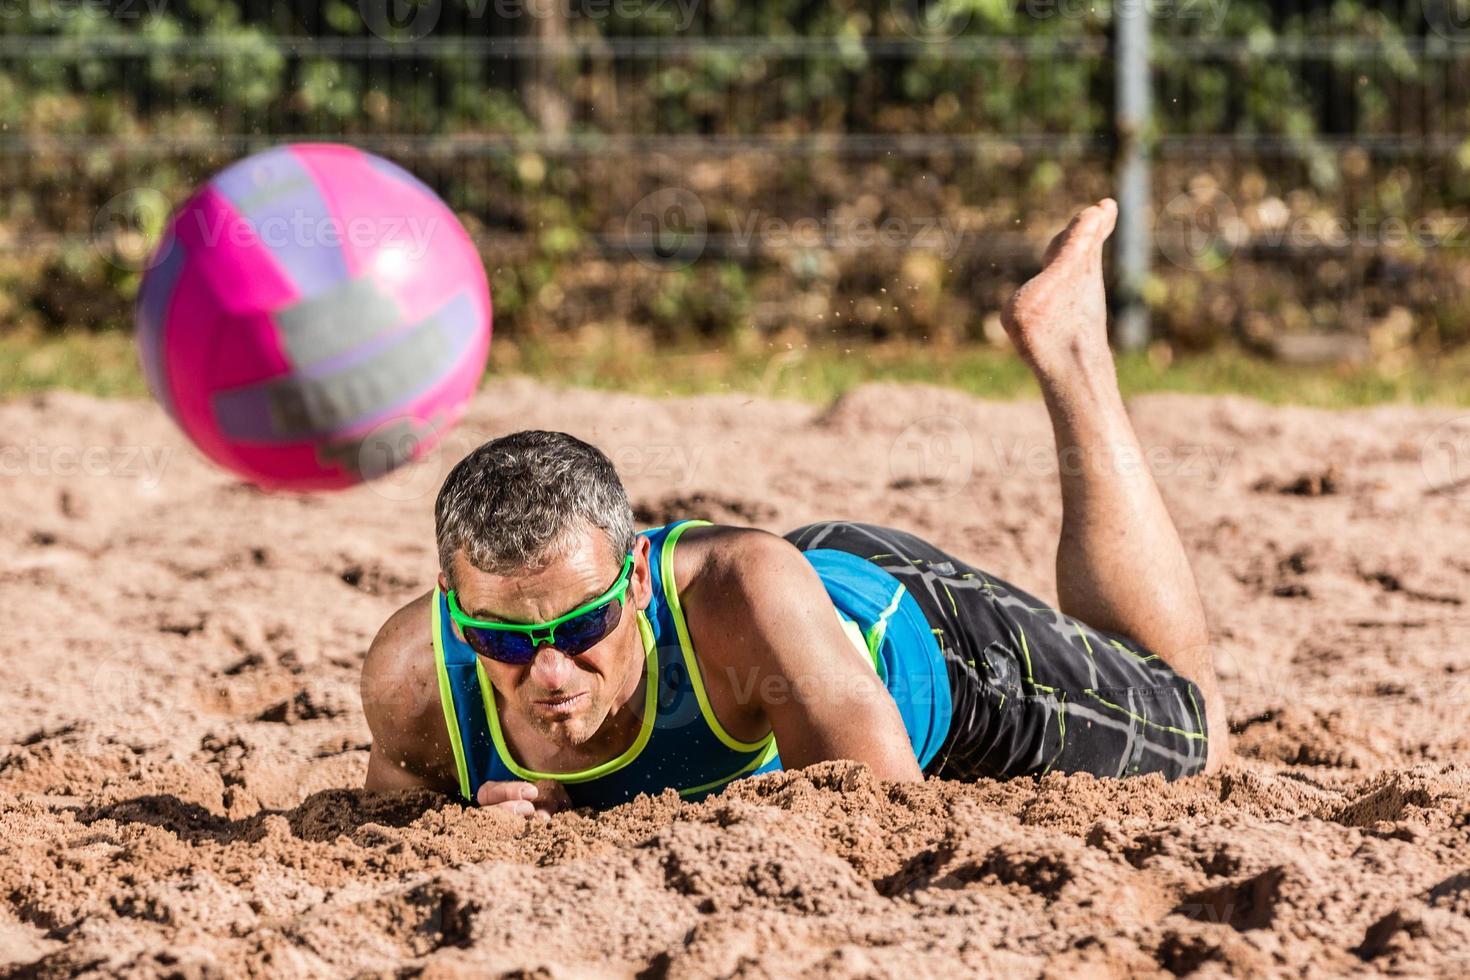 beachvolleyballer sdraiato nella sabbia foto